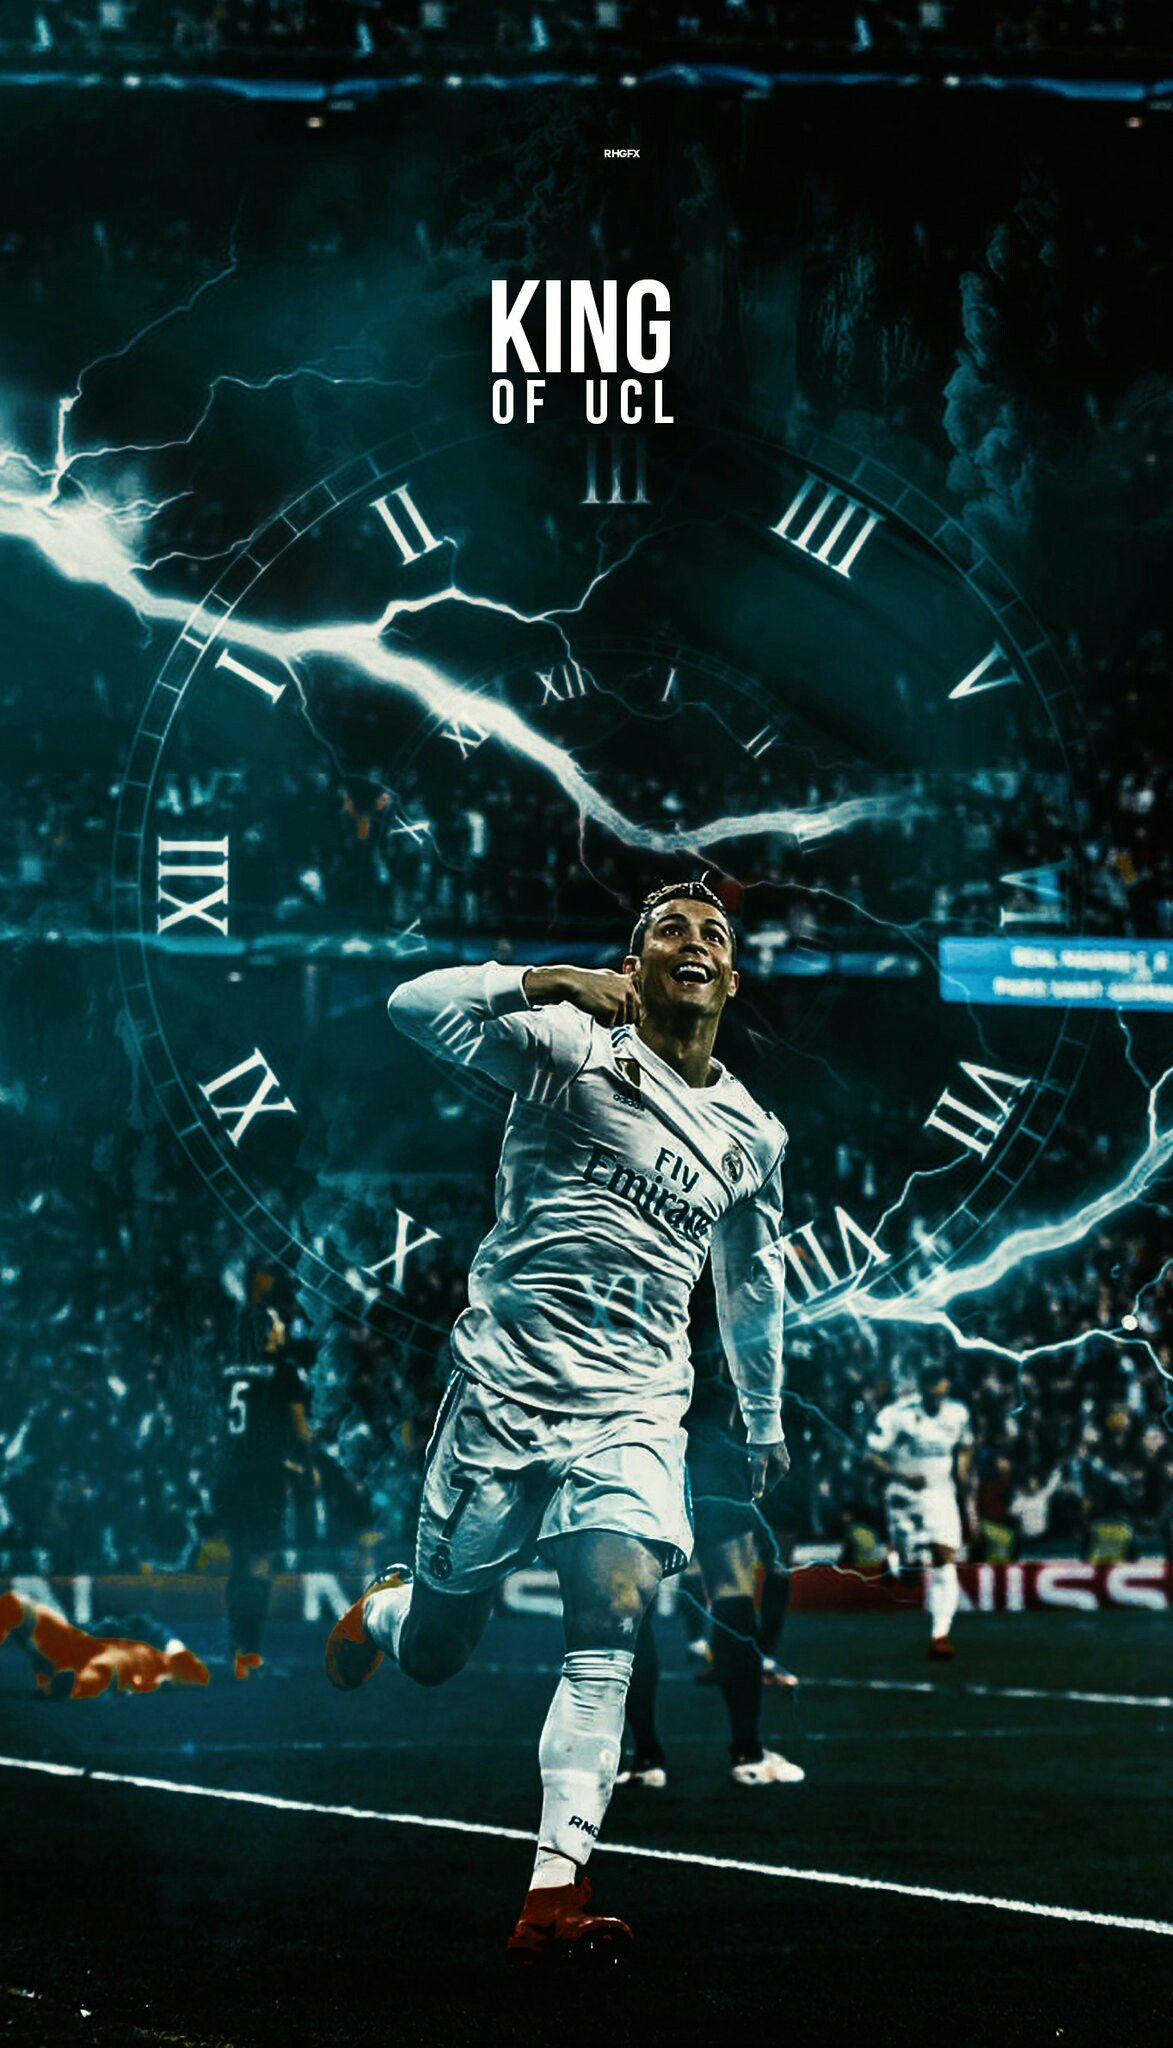 Cr7 Real Madrid Ronaldo Madrid Real Madrid Wallpapers Ronaldo Wallpapers